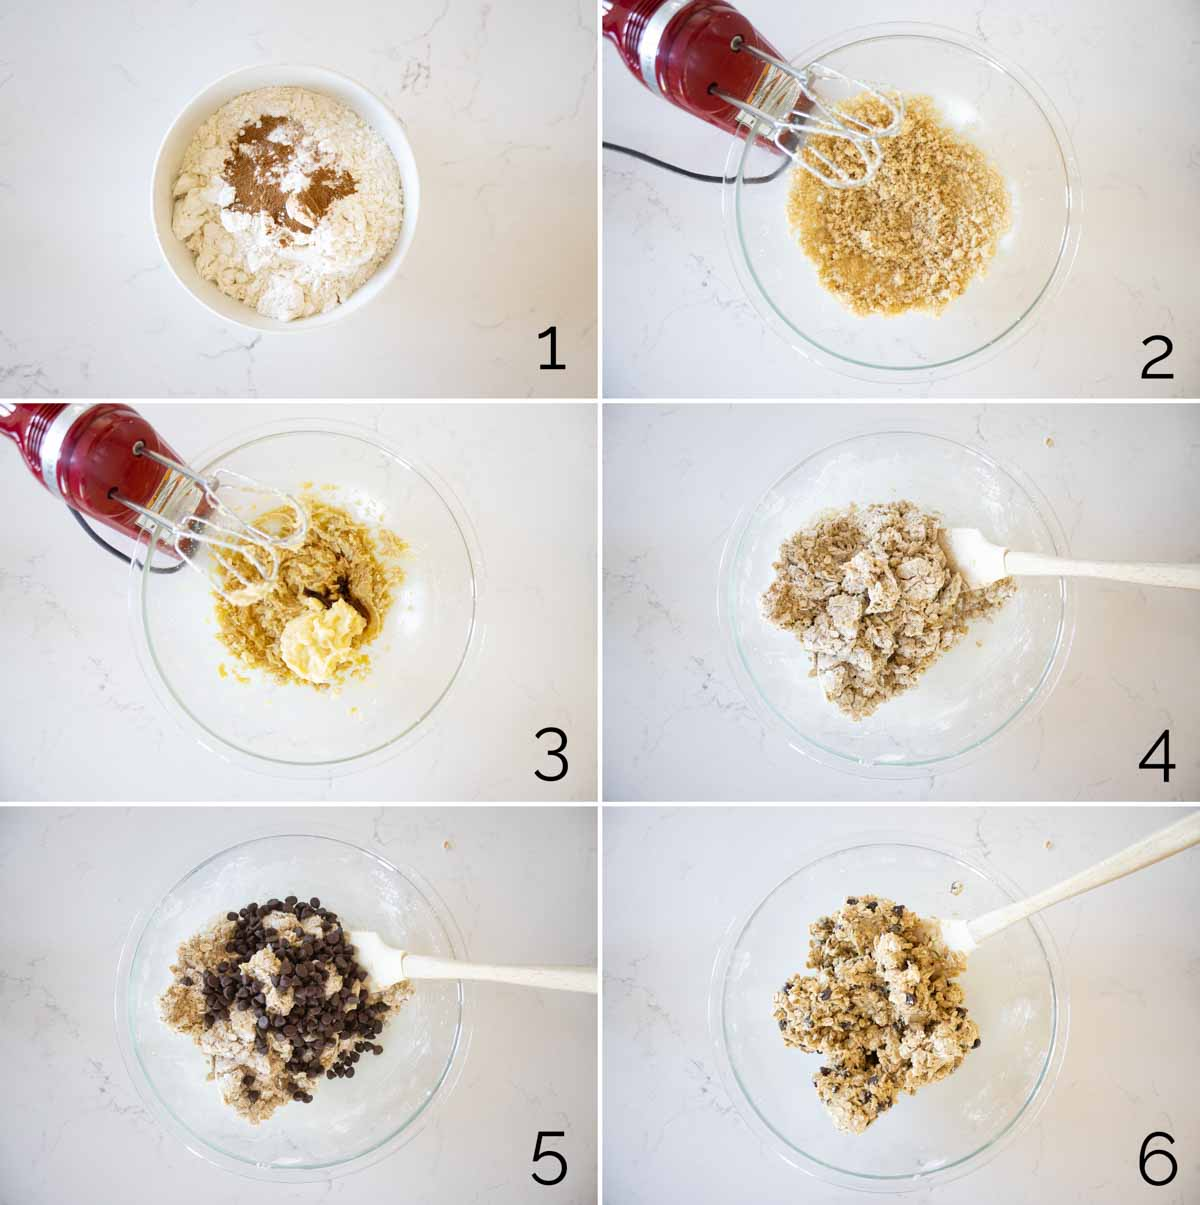 steps to make banana oatmeal cookies